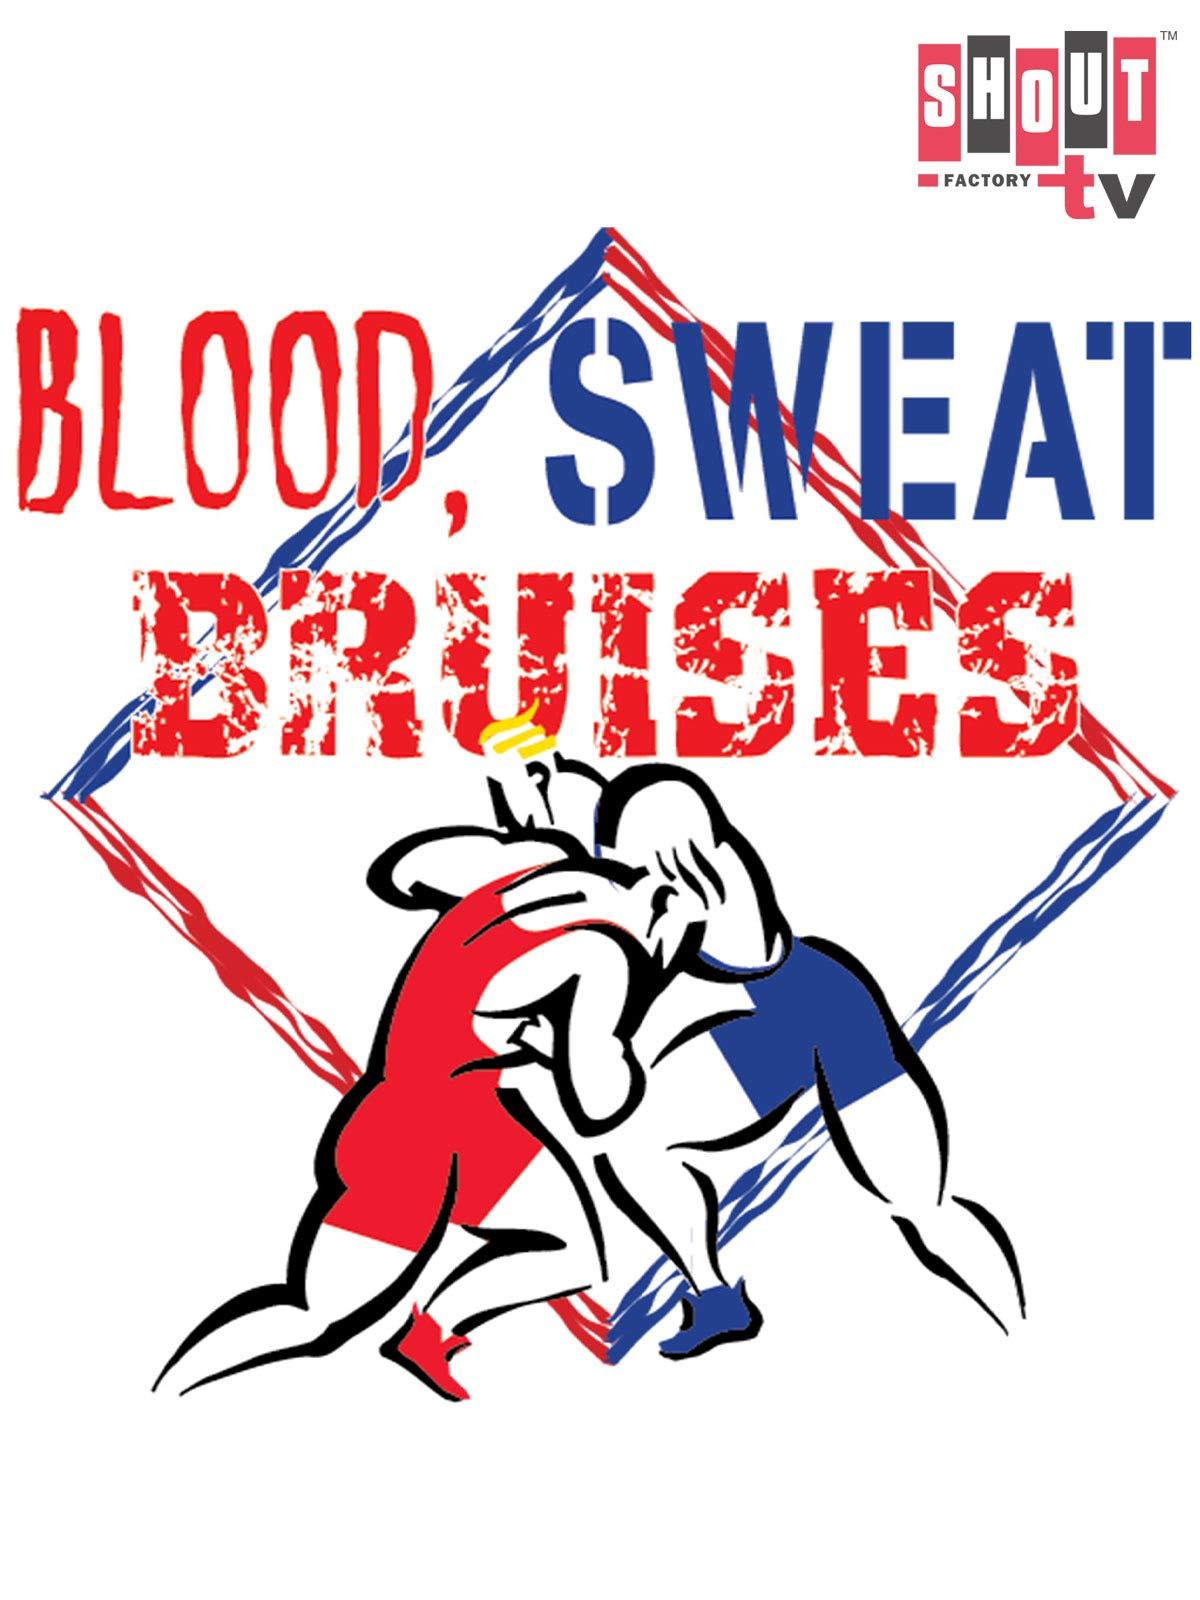 Classic Wrestling: Blood, Sweat & Bruises